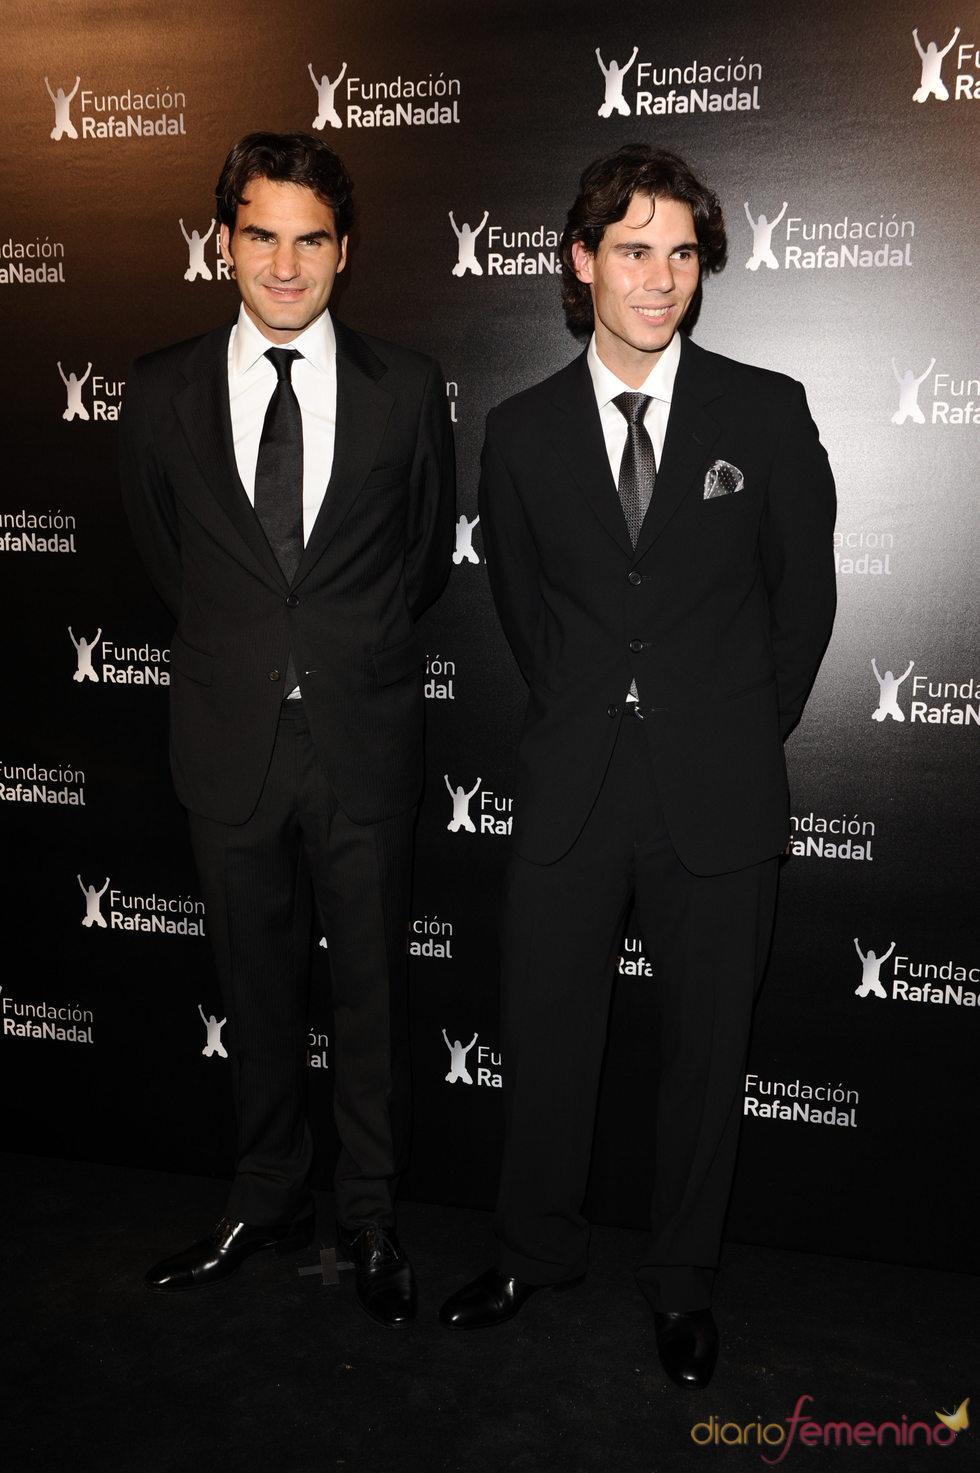 Roger Federer y Rafa Nadal, de cena benéfica